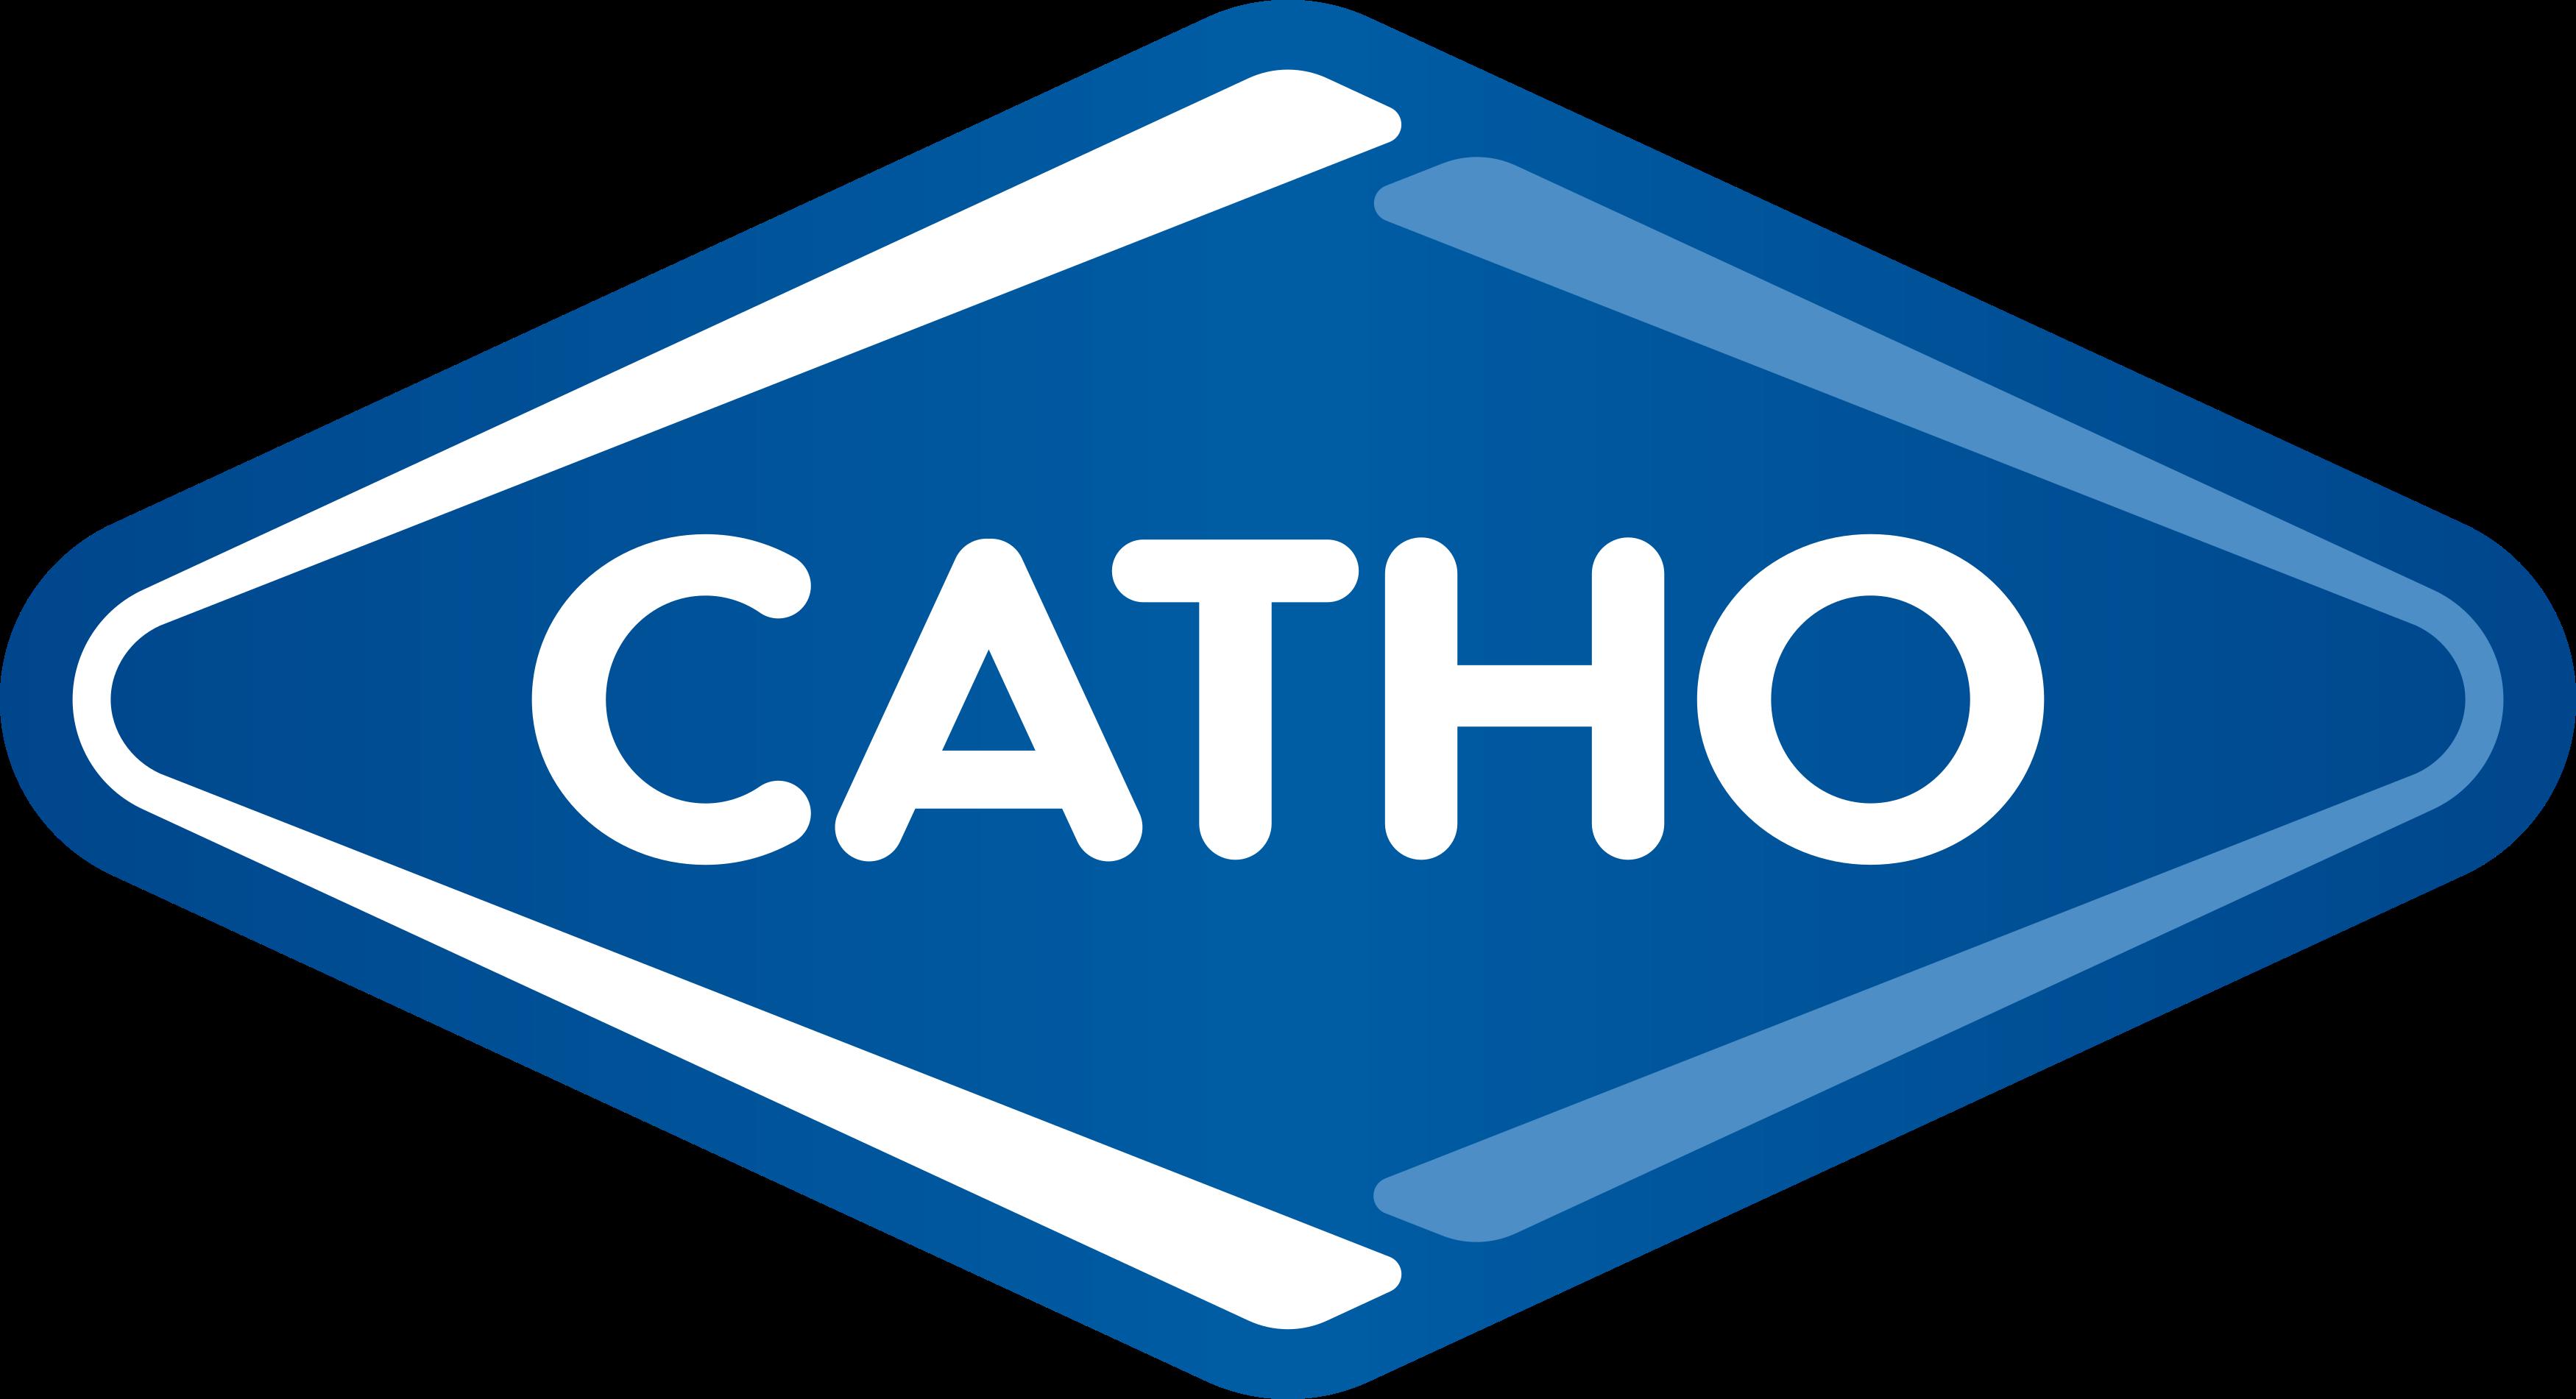 Catho Logo.